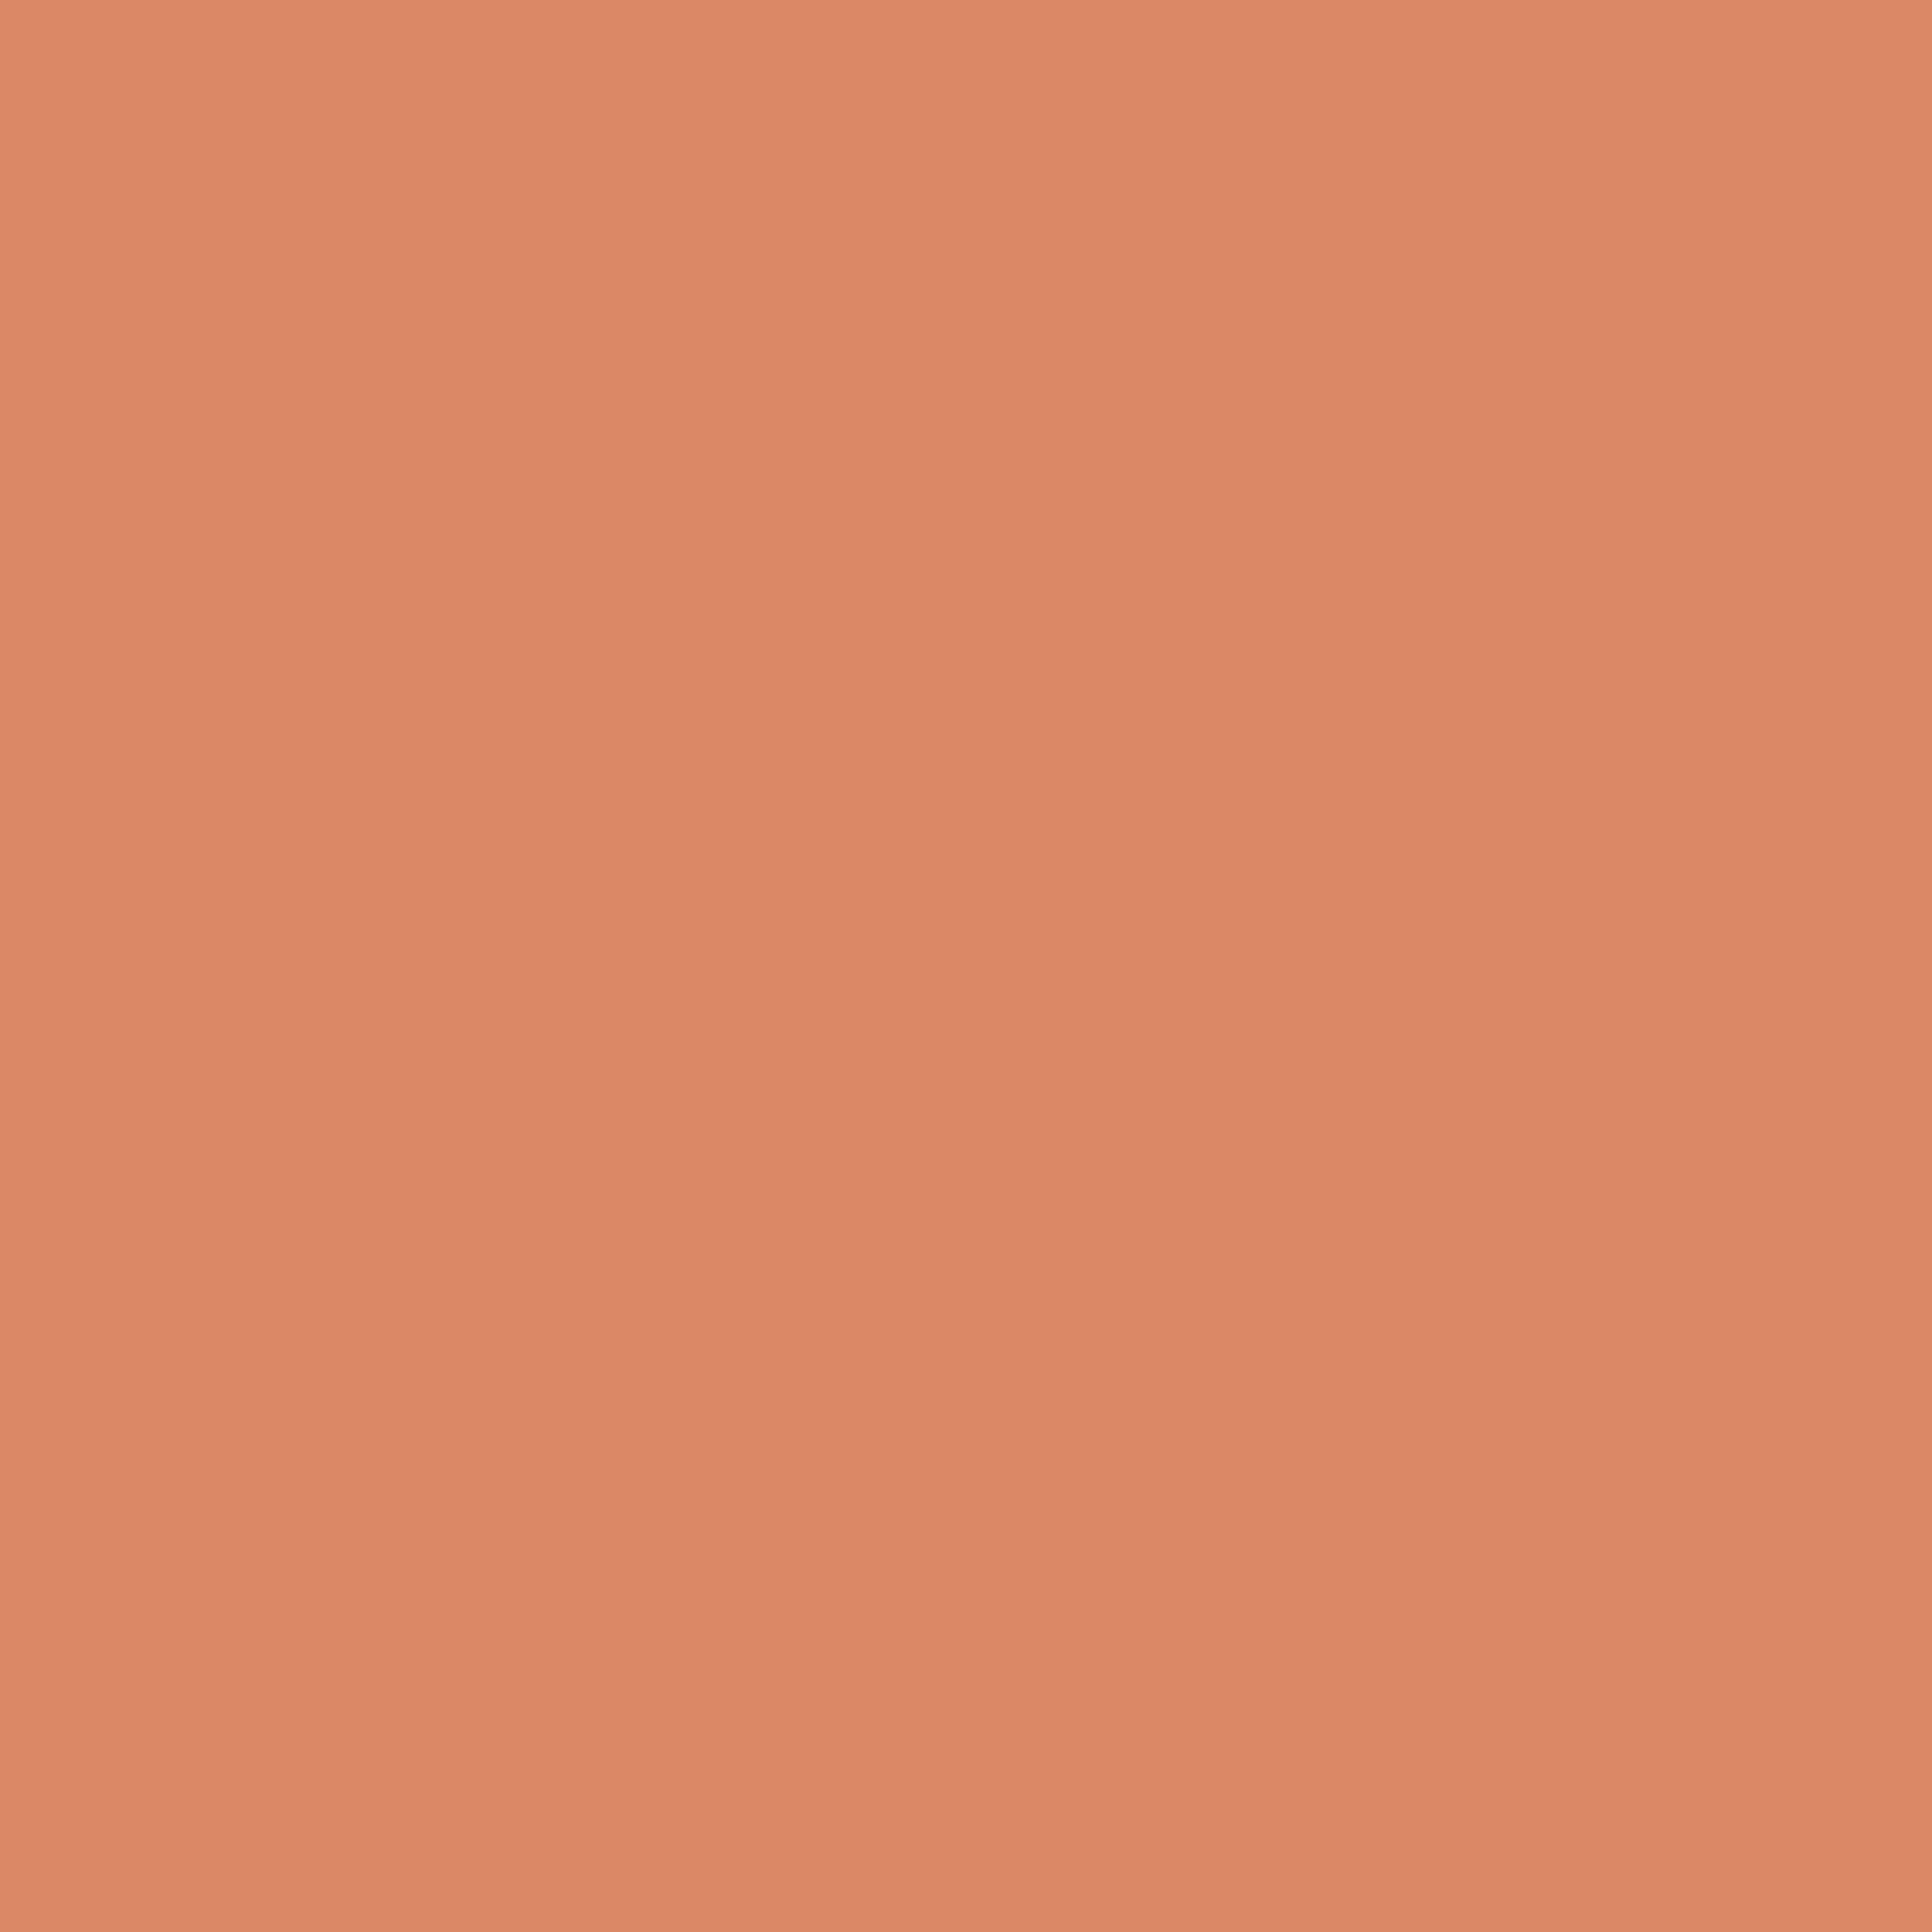 2732x2732 Pale Copper Solid Color Background